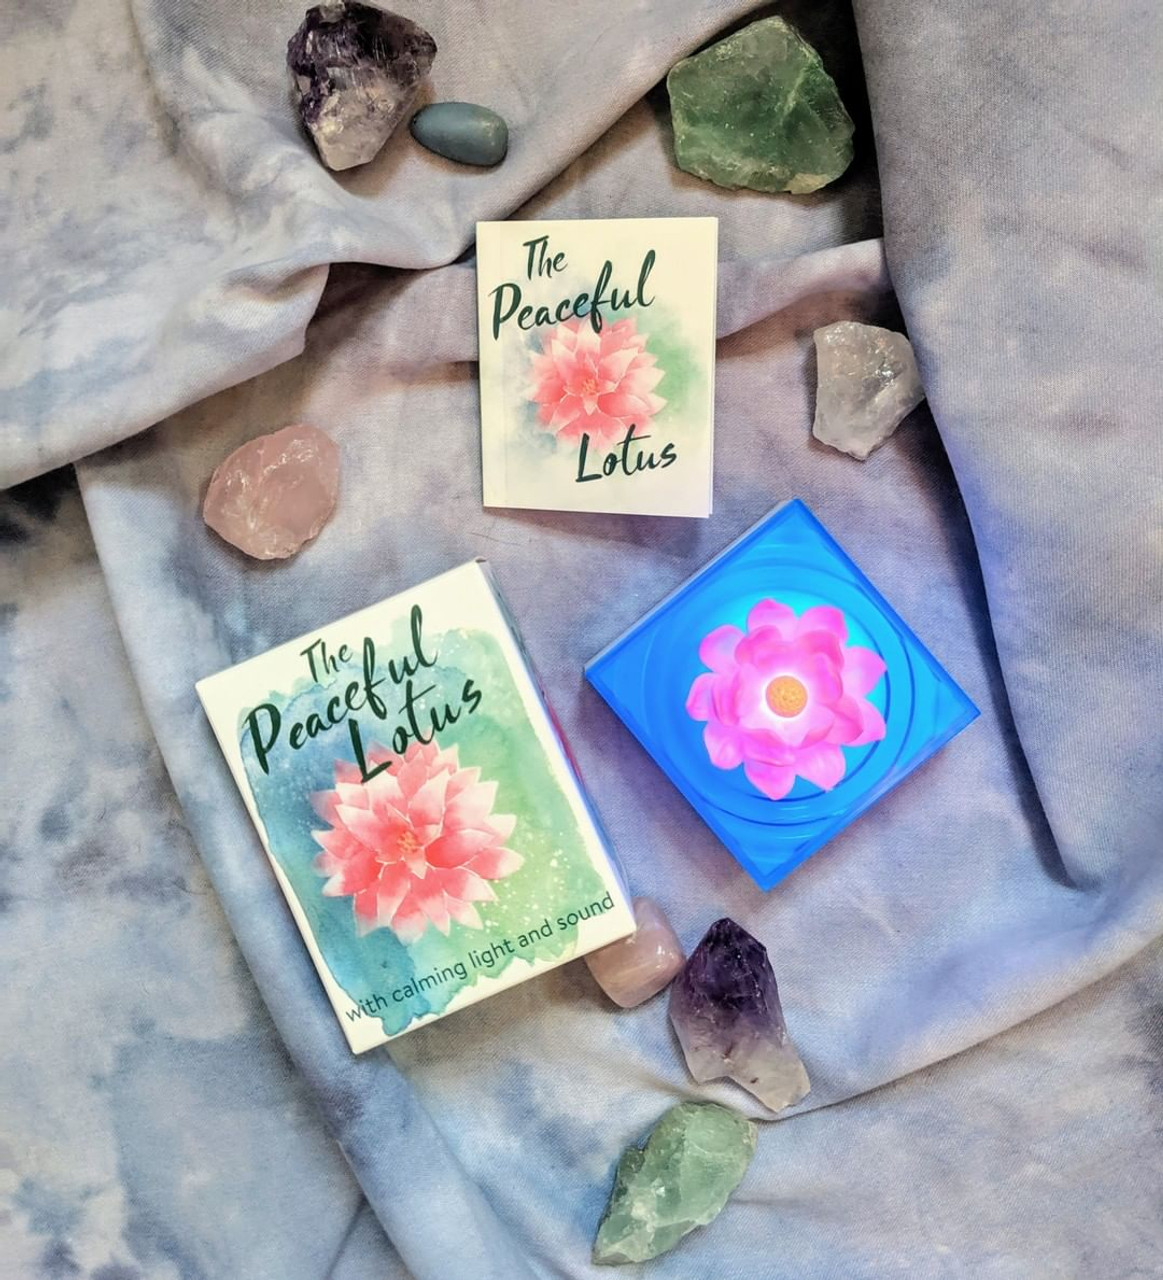 Mini Peaceful Lotus Calming Light + Sound